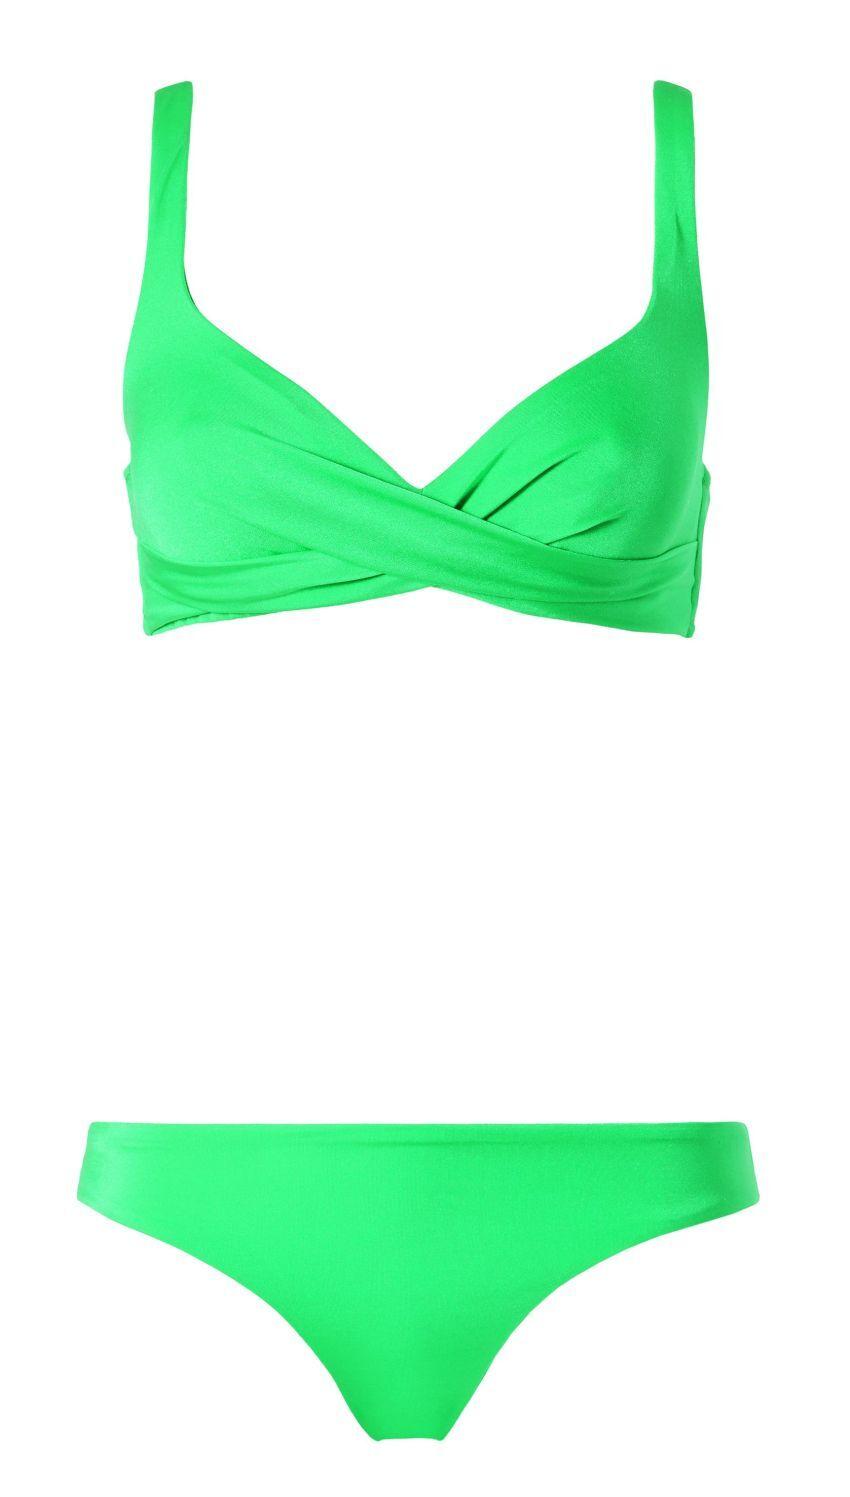 zelené plavky Calzedonia